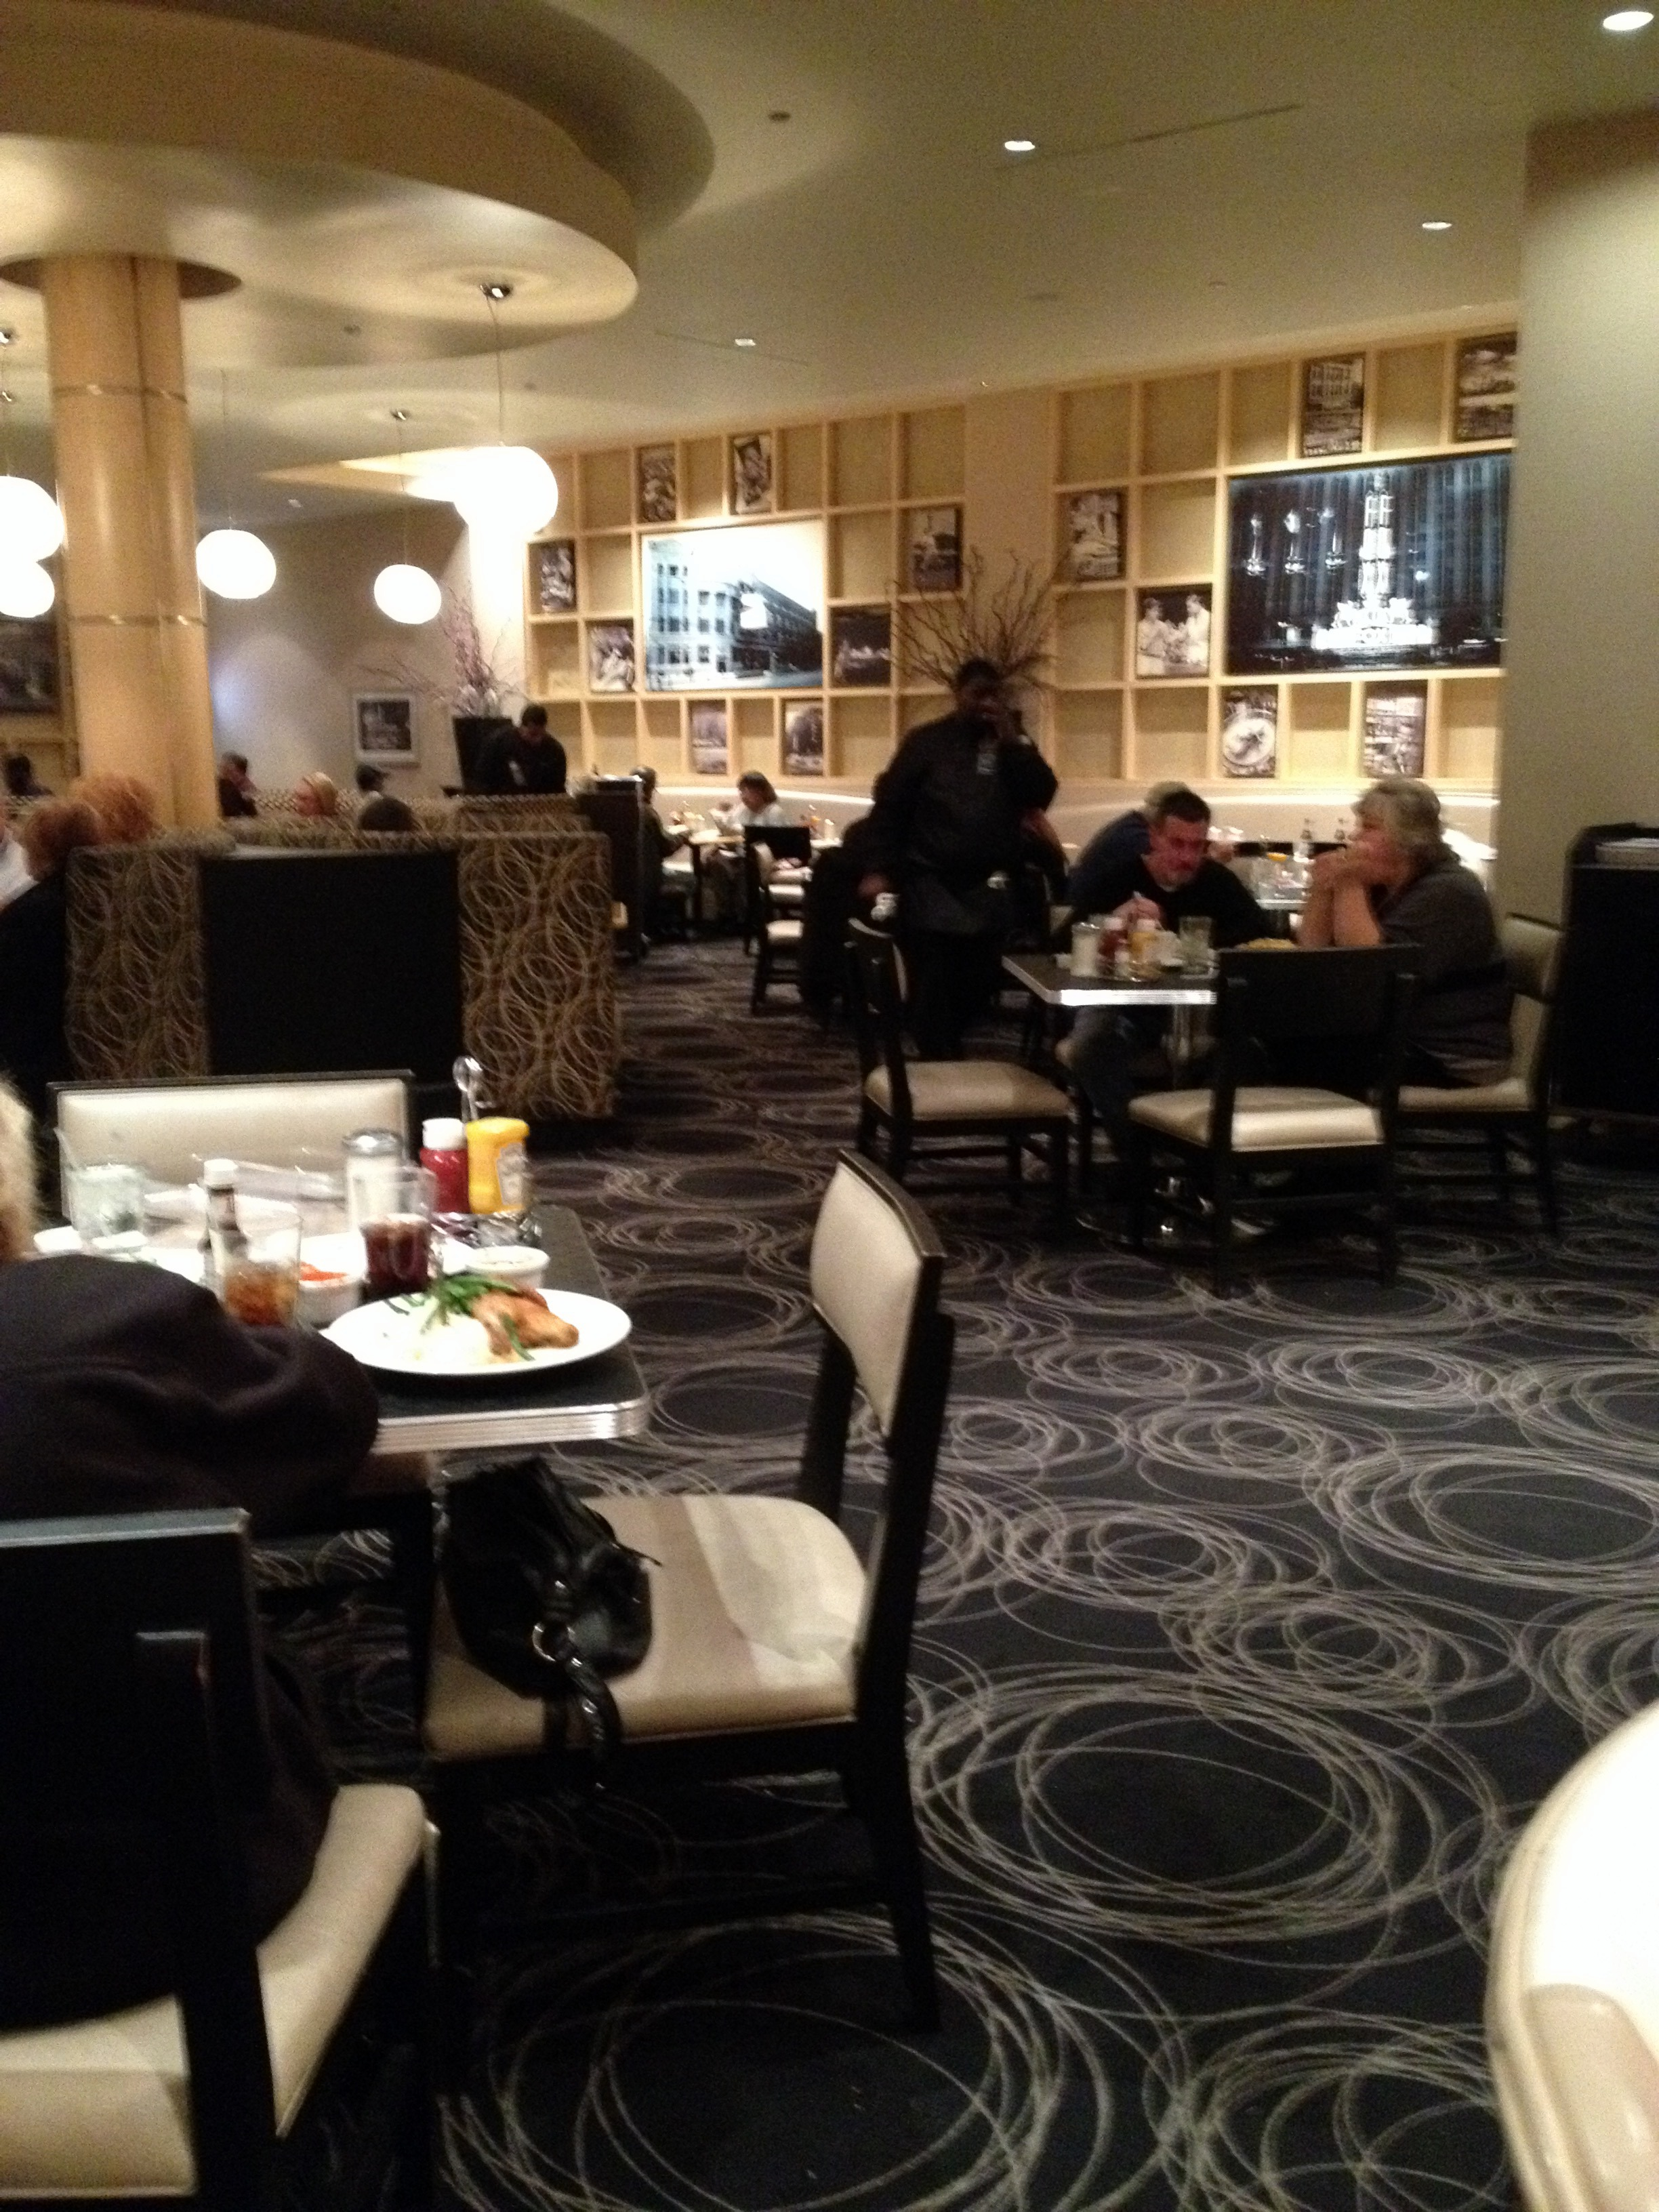 The lodge diner motor city casino sim free online slot casino